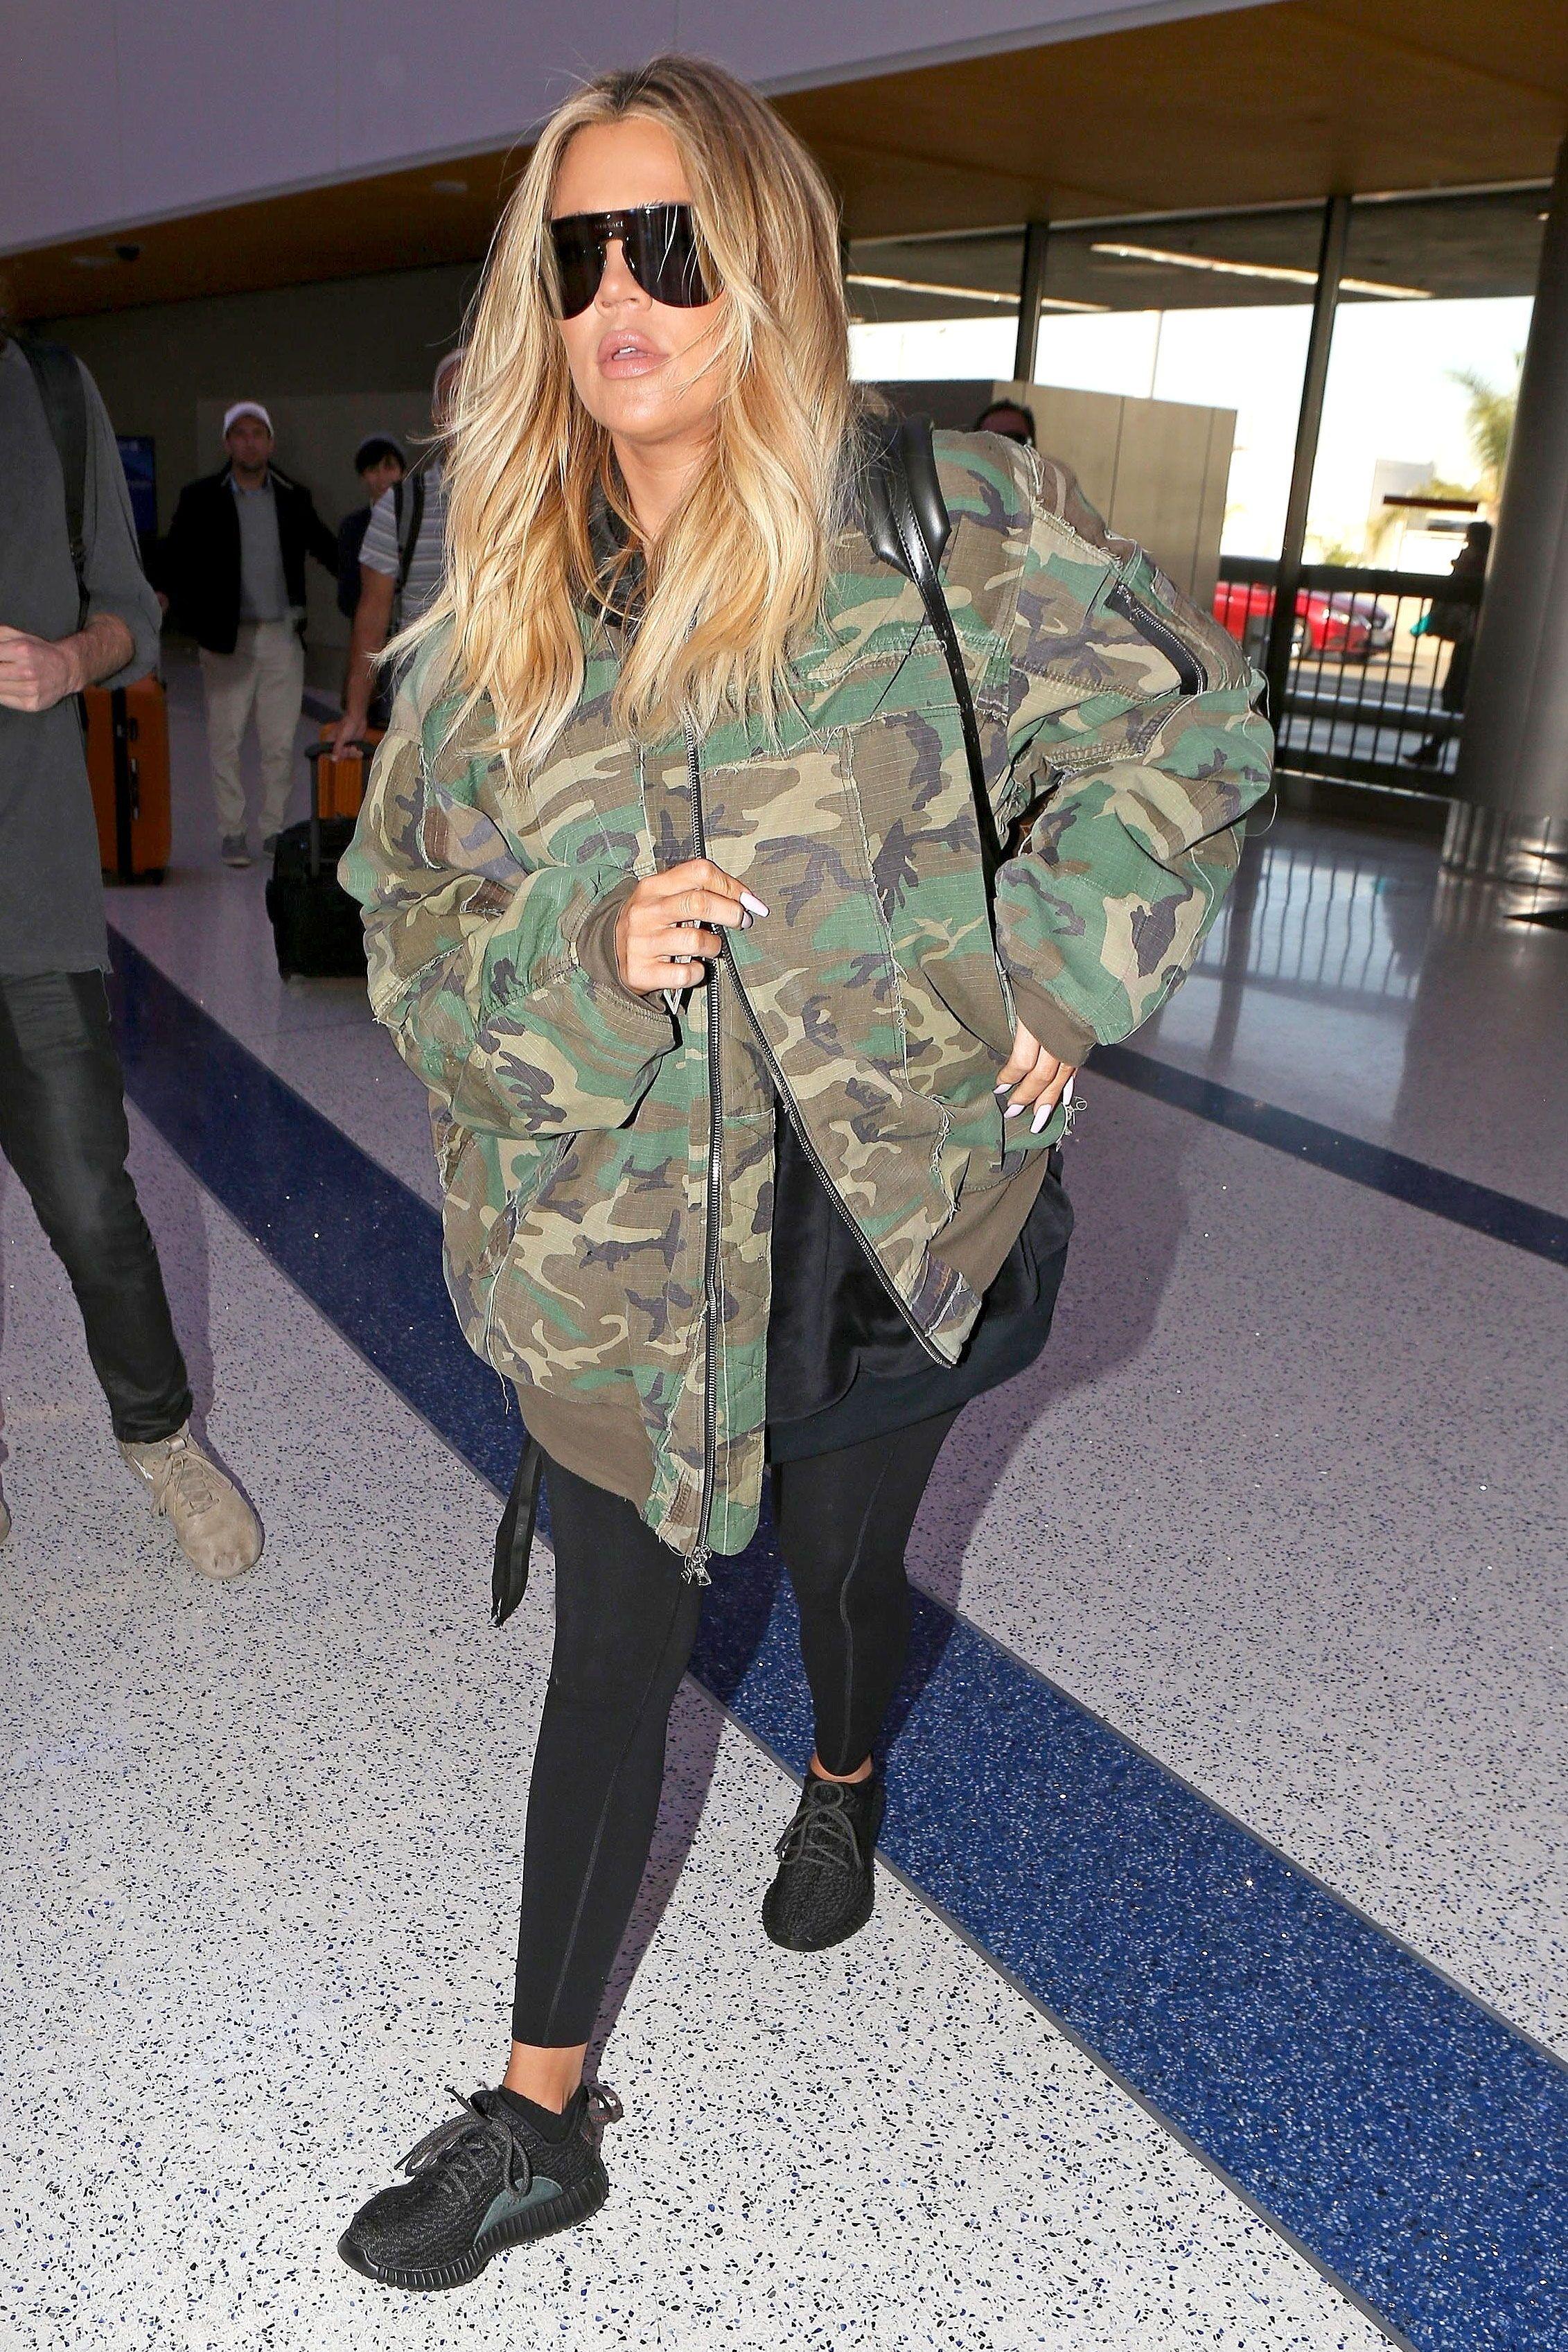 These Women S Bomber Jackets Are Celebrity Approved Kardashian Style Outfits Khloe Kardashian Style Bomber Jacket Women [ 3394 x 2263 Pixel ]